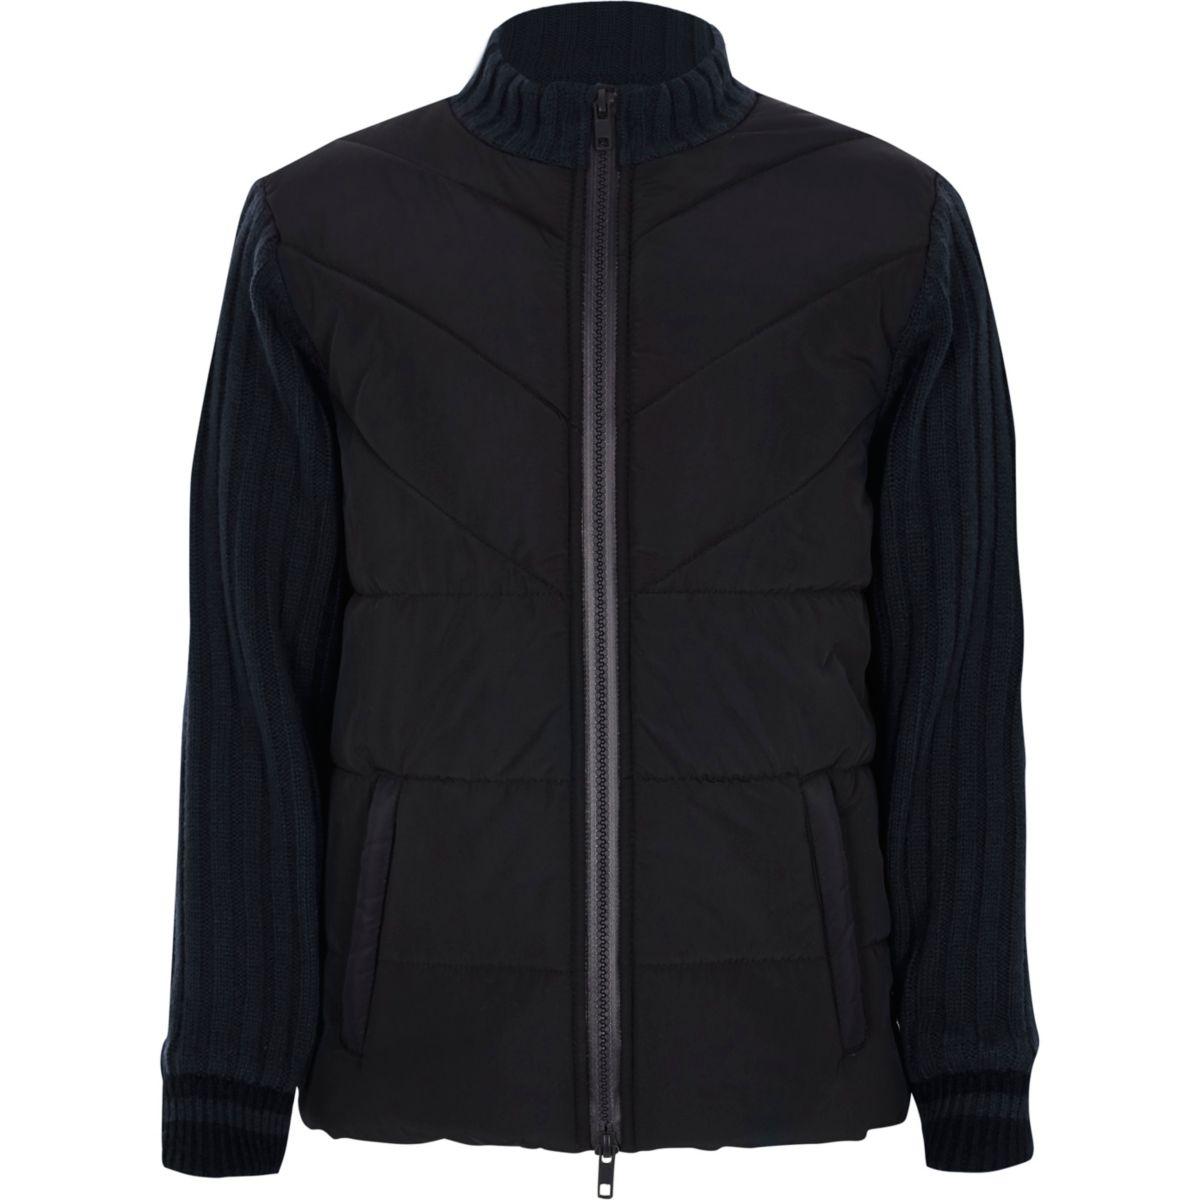 Boys navy puffer front knit hybrid jacket